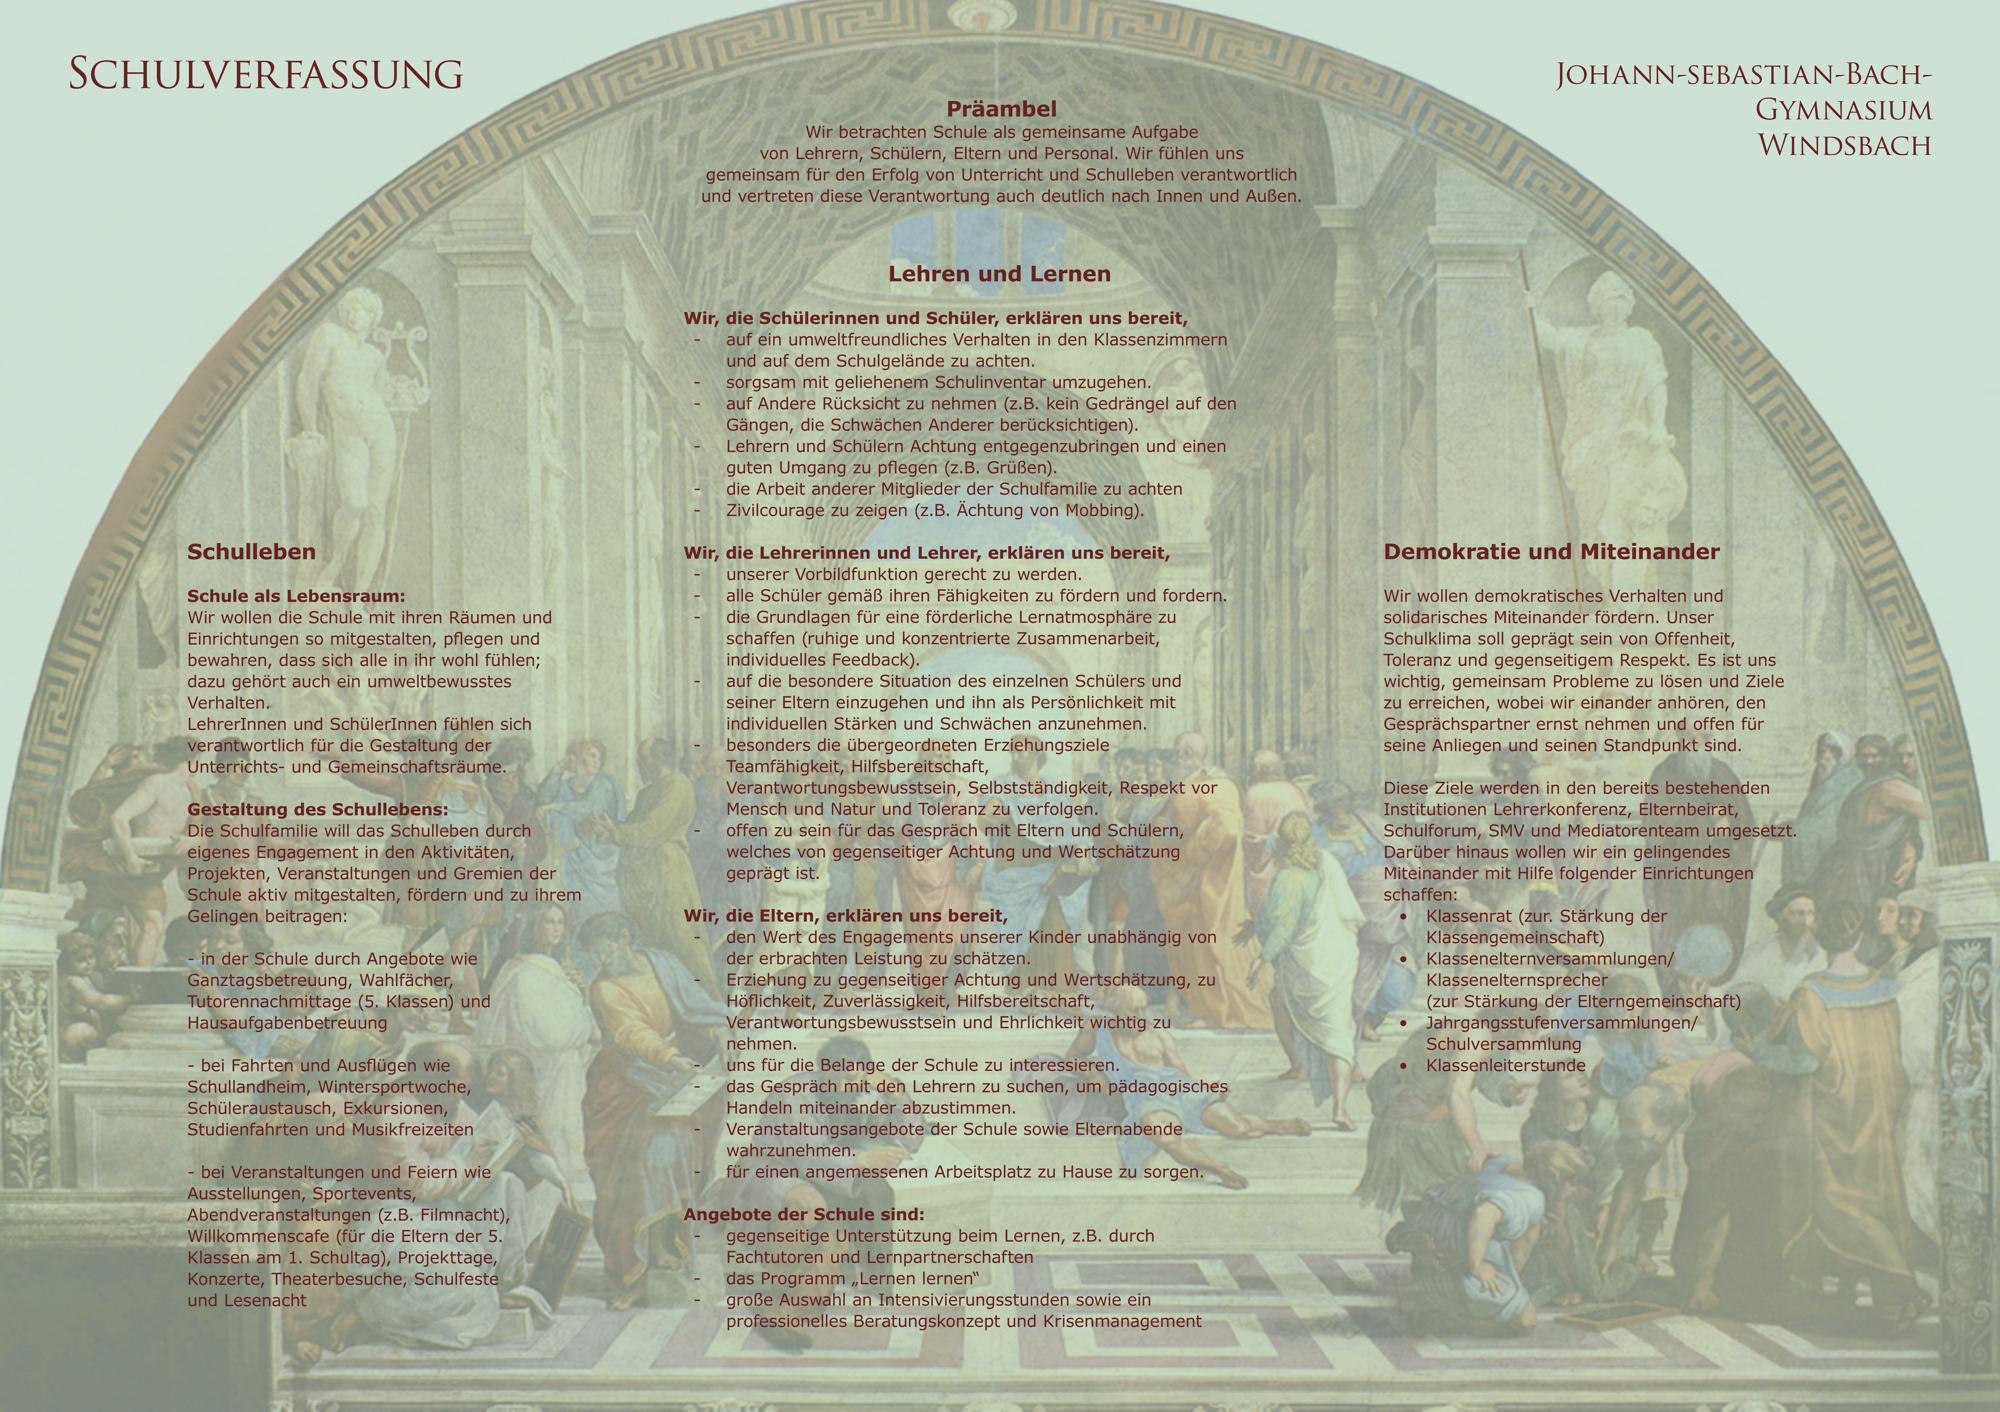 Schulverfassung des Johann-Sebastian-Bach-Gymnasiums Windsbach